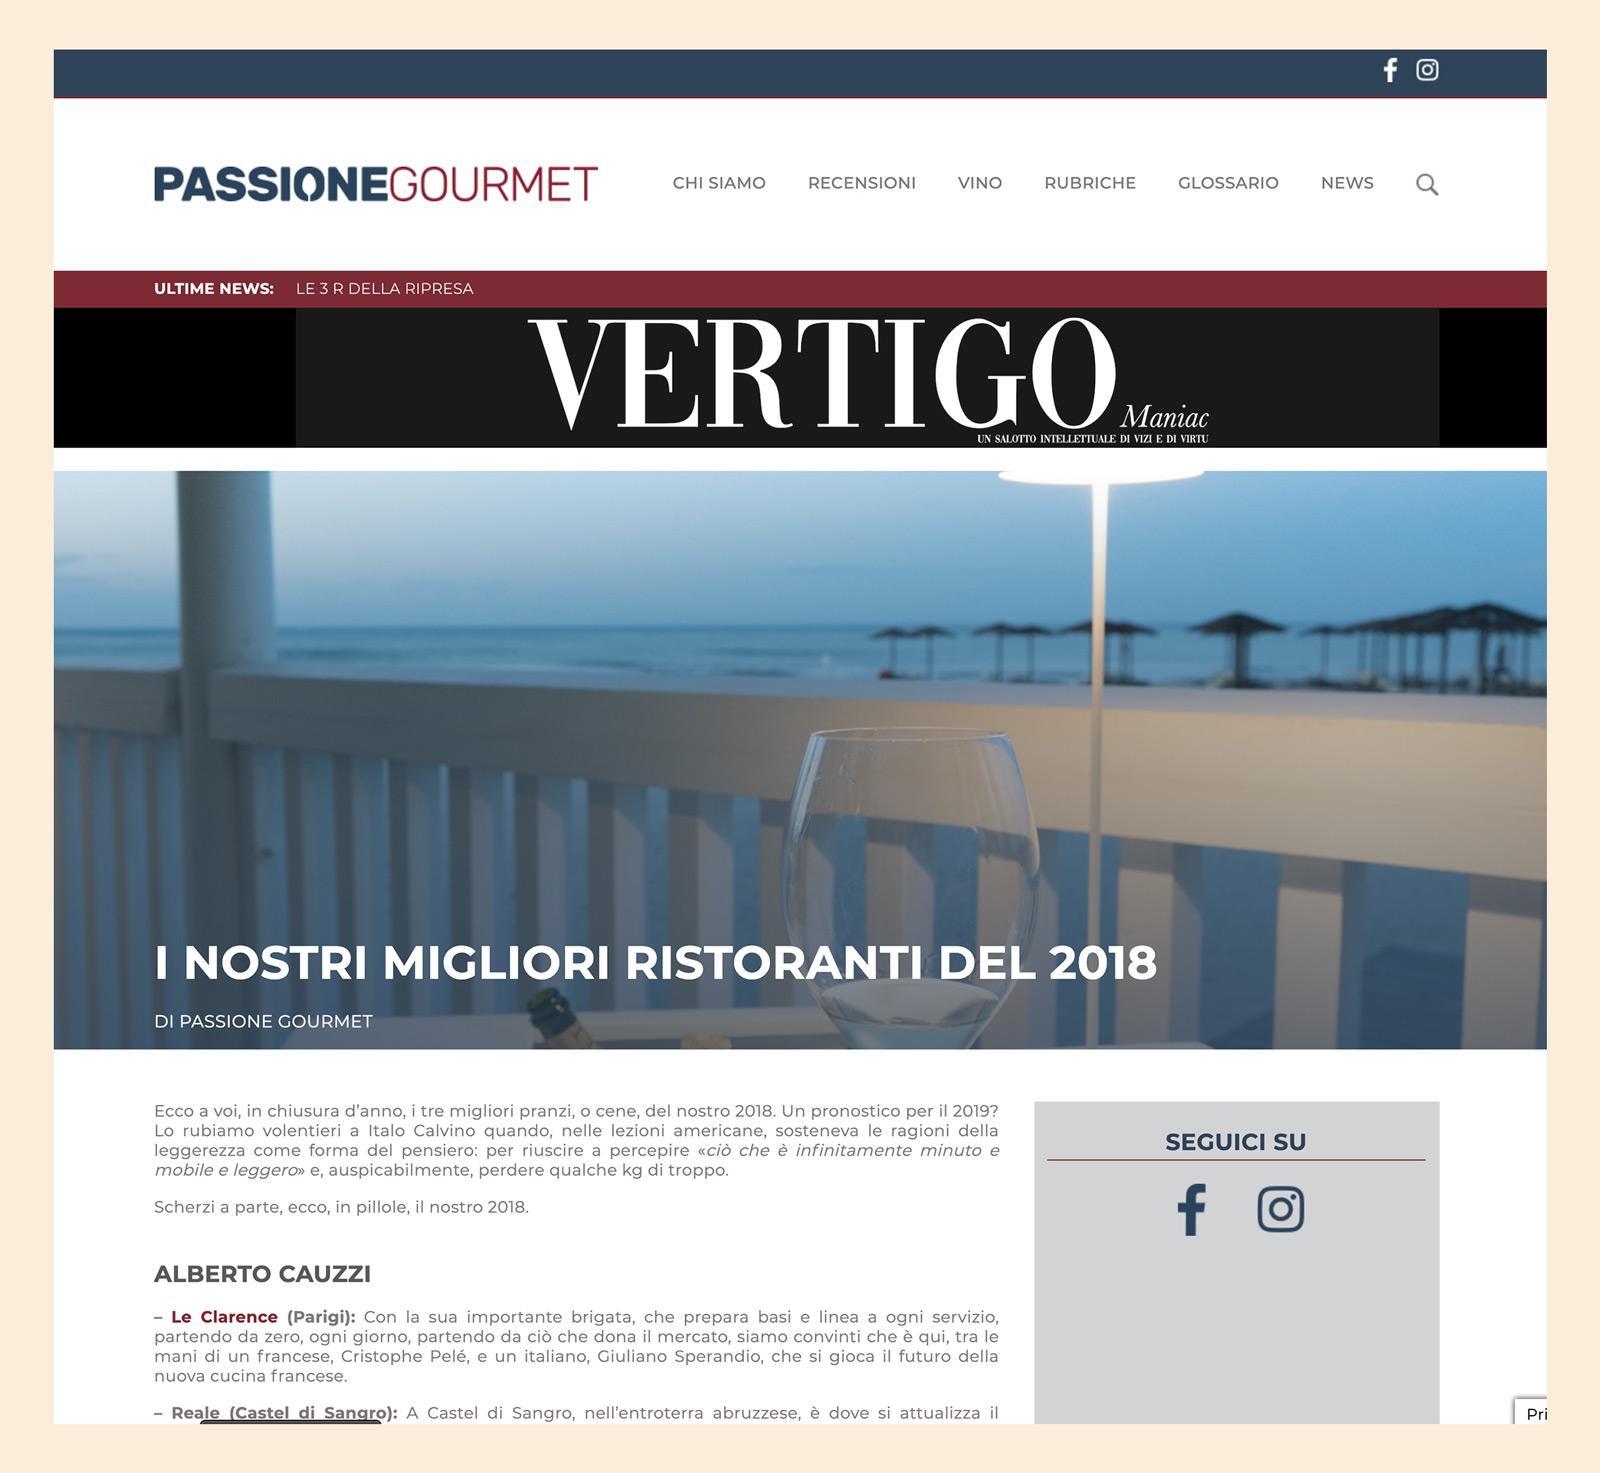 Alberto Gipponi - Passionegourmet 2018